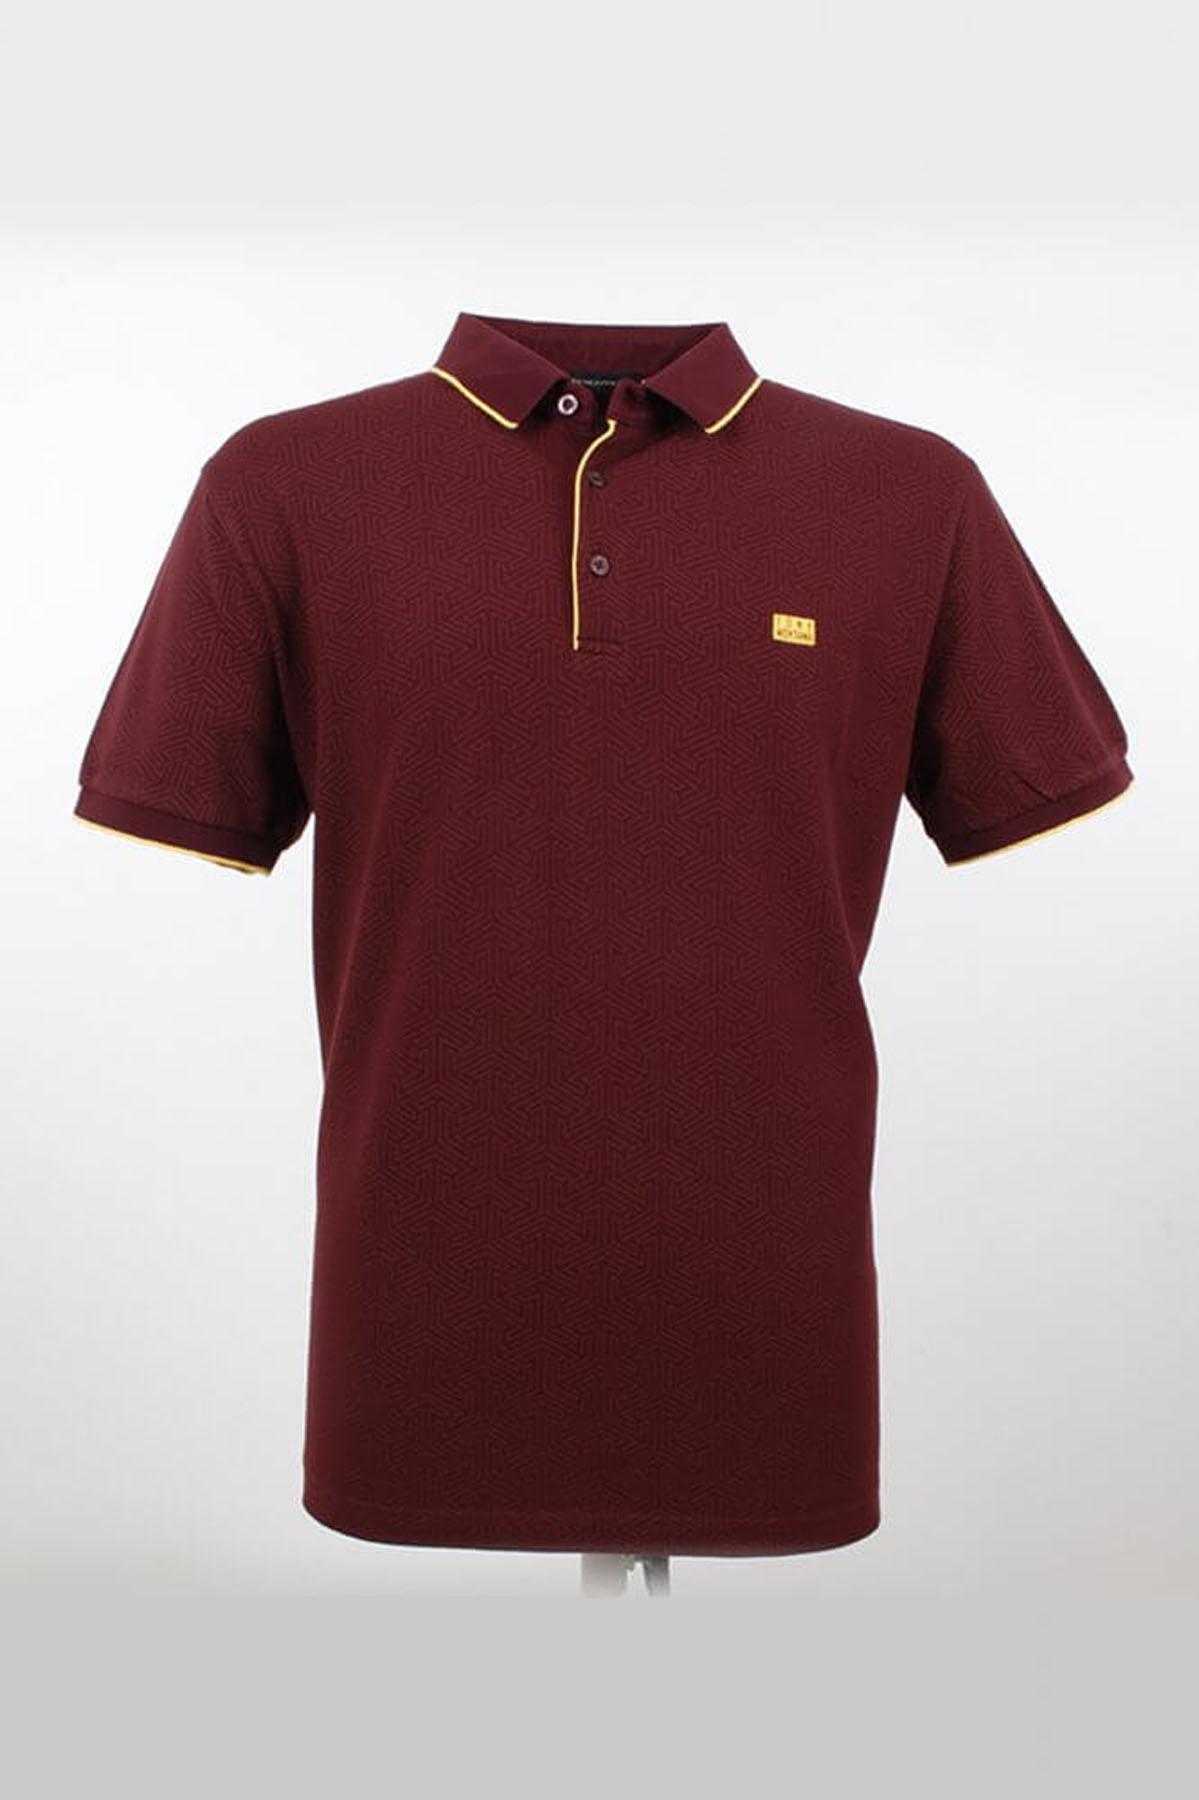 Polo Yaka Çizgi Detaylı K.Bordo T-Shirt